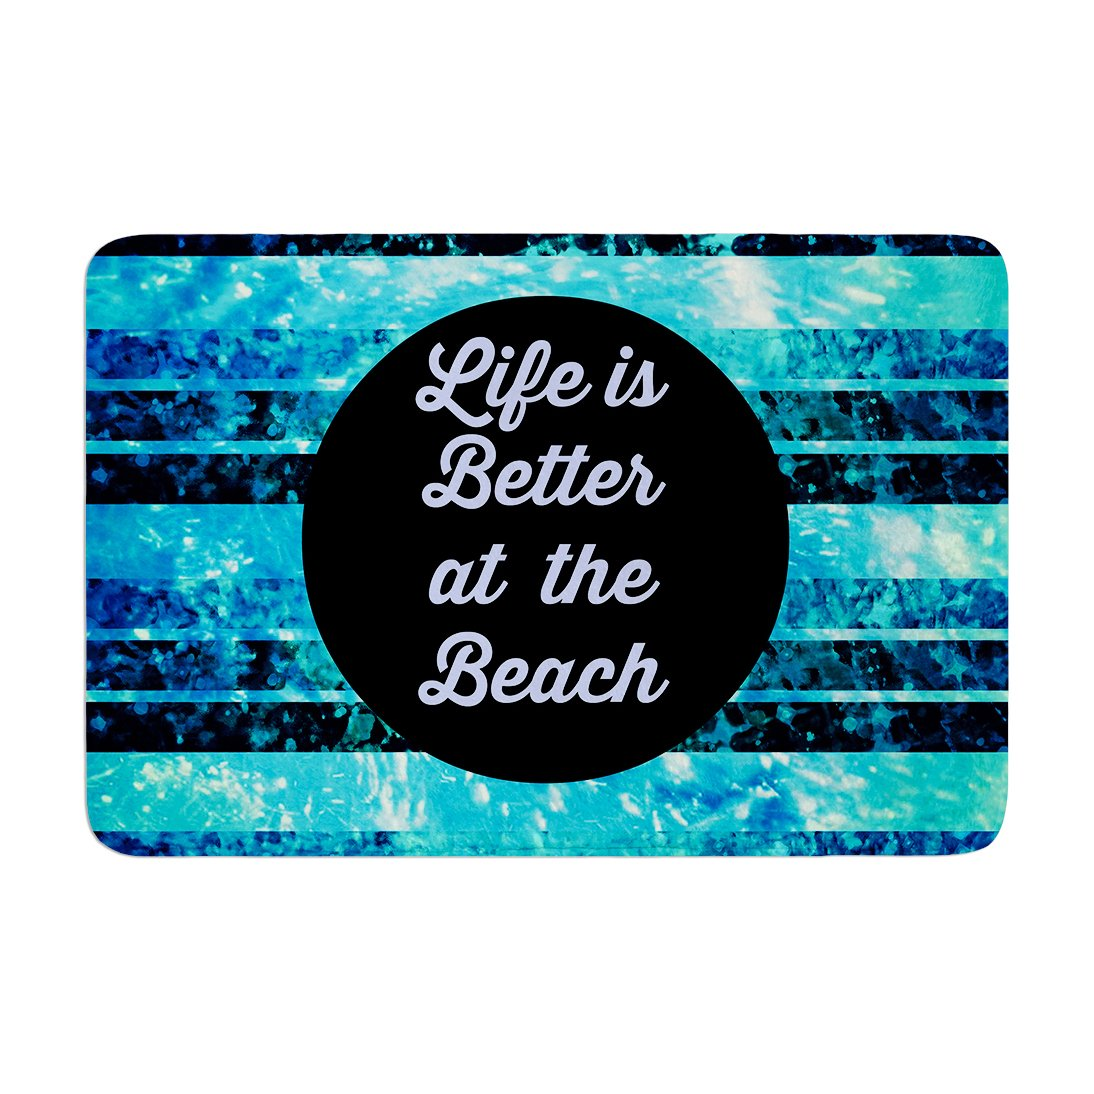 17 by 24 Kess InHouse EBI Emporium Life is Better at The Beach Blue Aqua Memory Foam Bath Mat